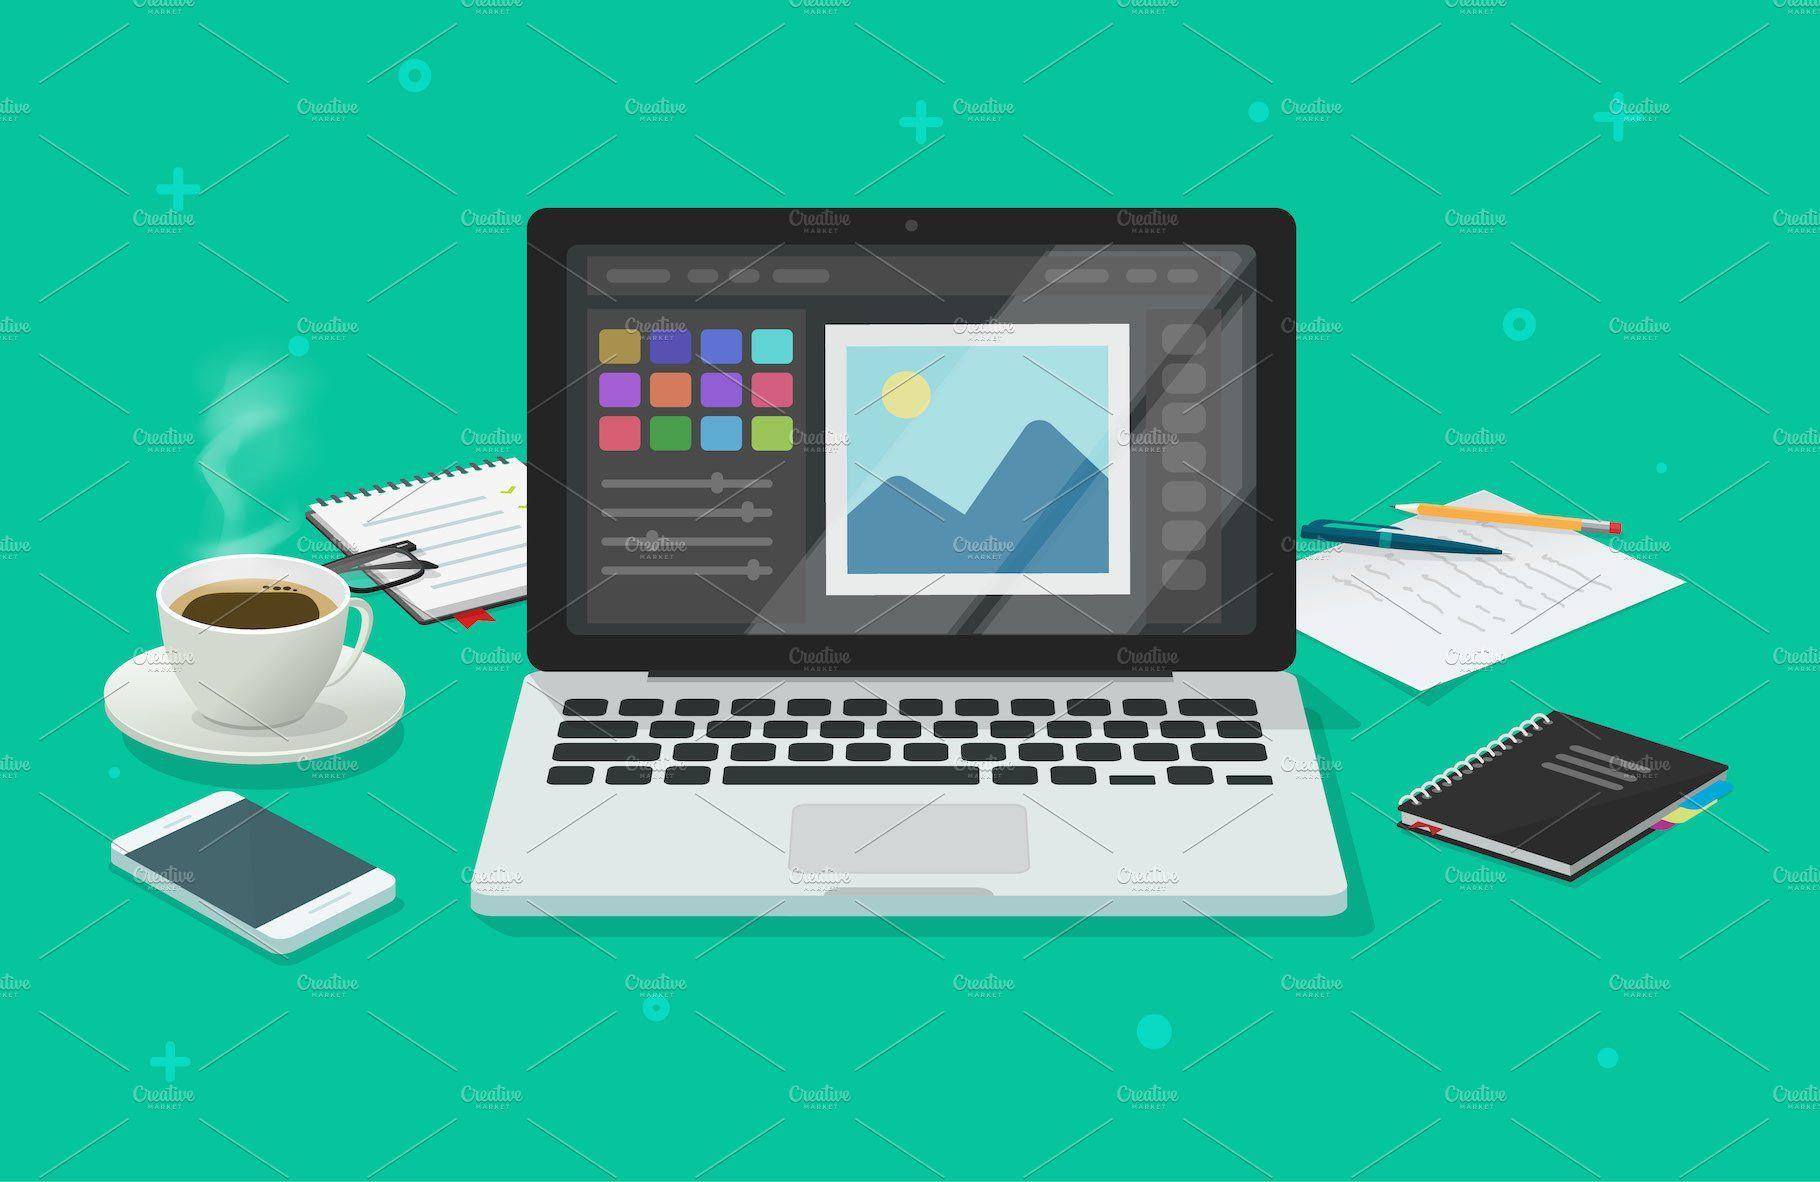 Image Photo Editor Software Desktop in 2020 Computer